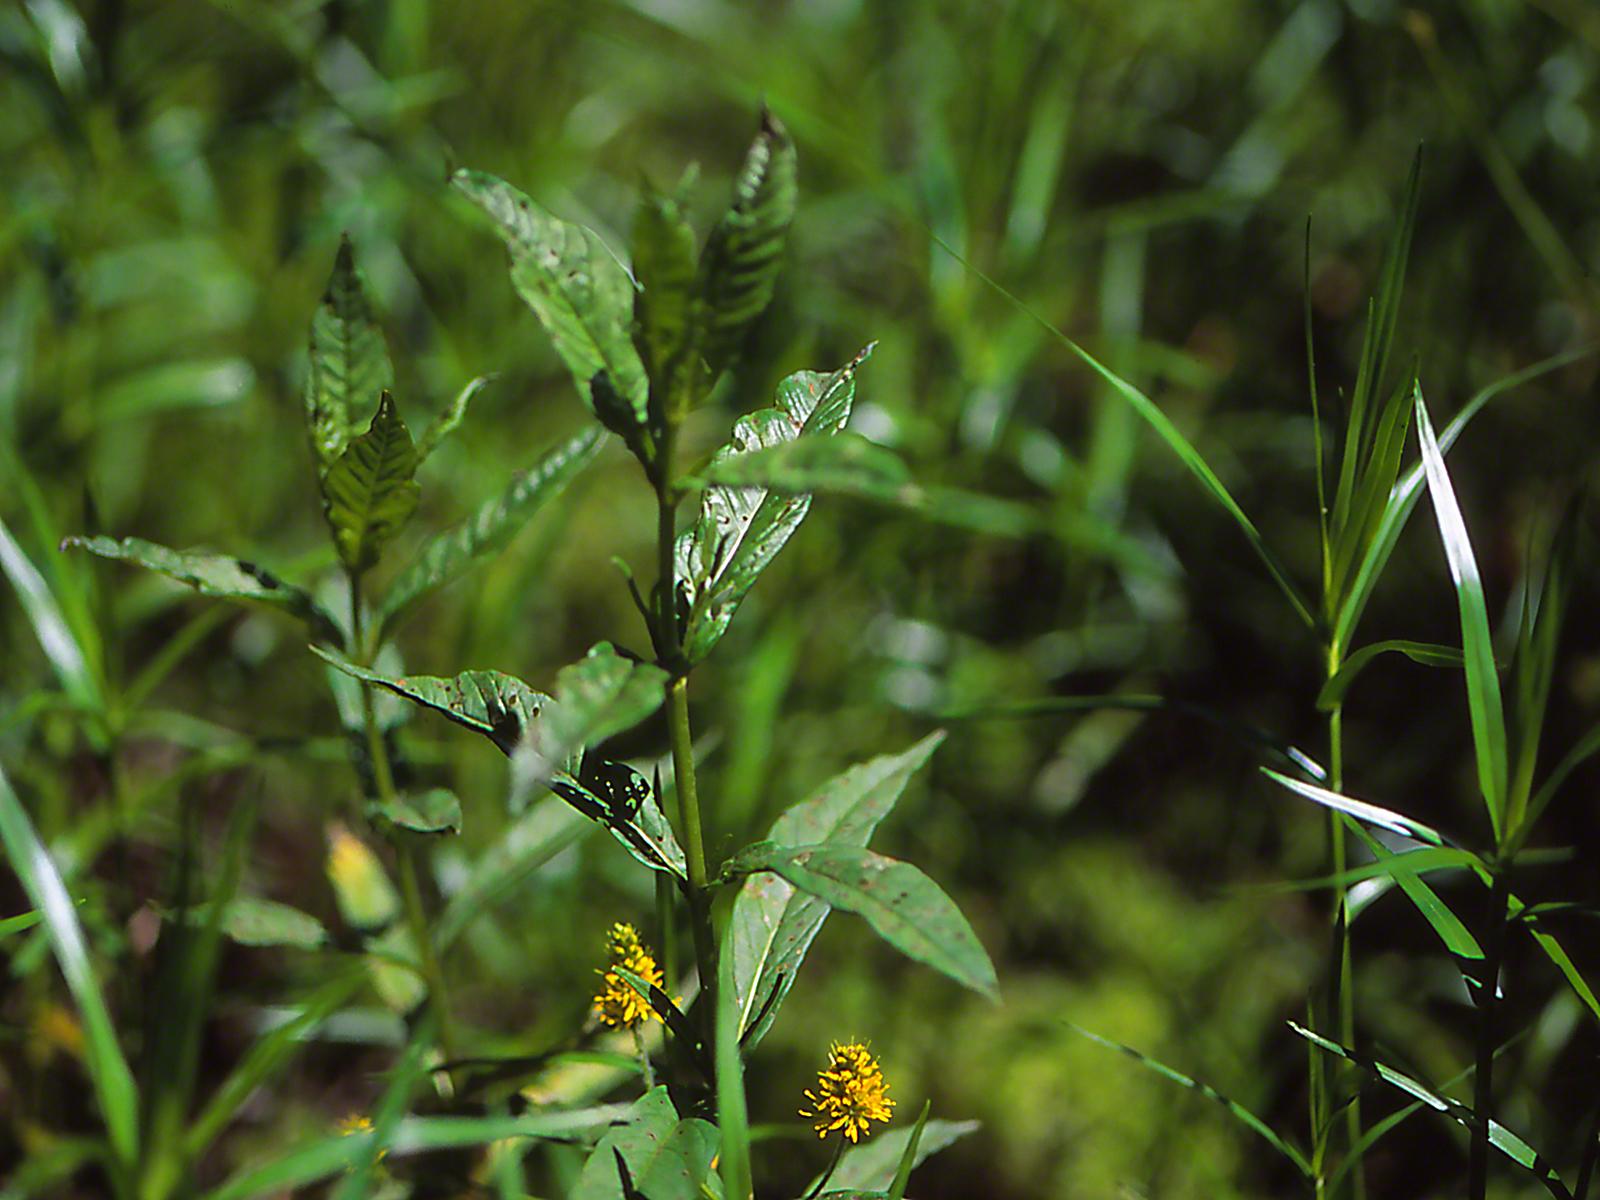 Wetland wildflower, photographed by Jeff Zablow at Watts Flats Wetland, NY